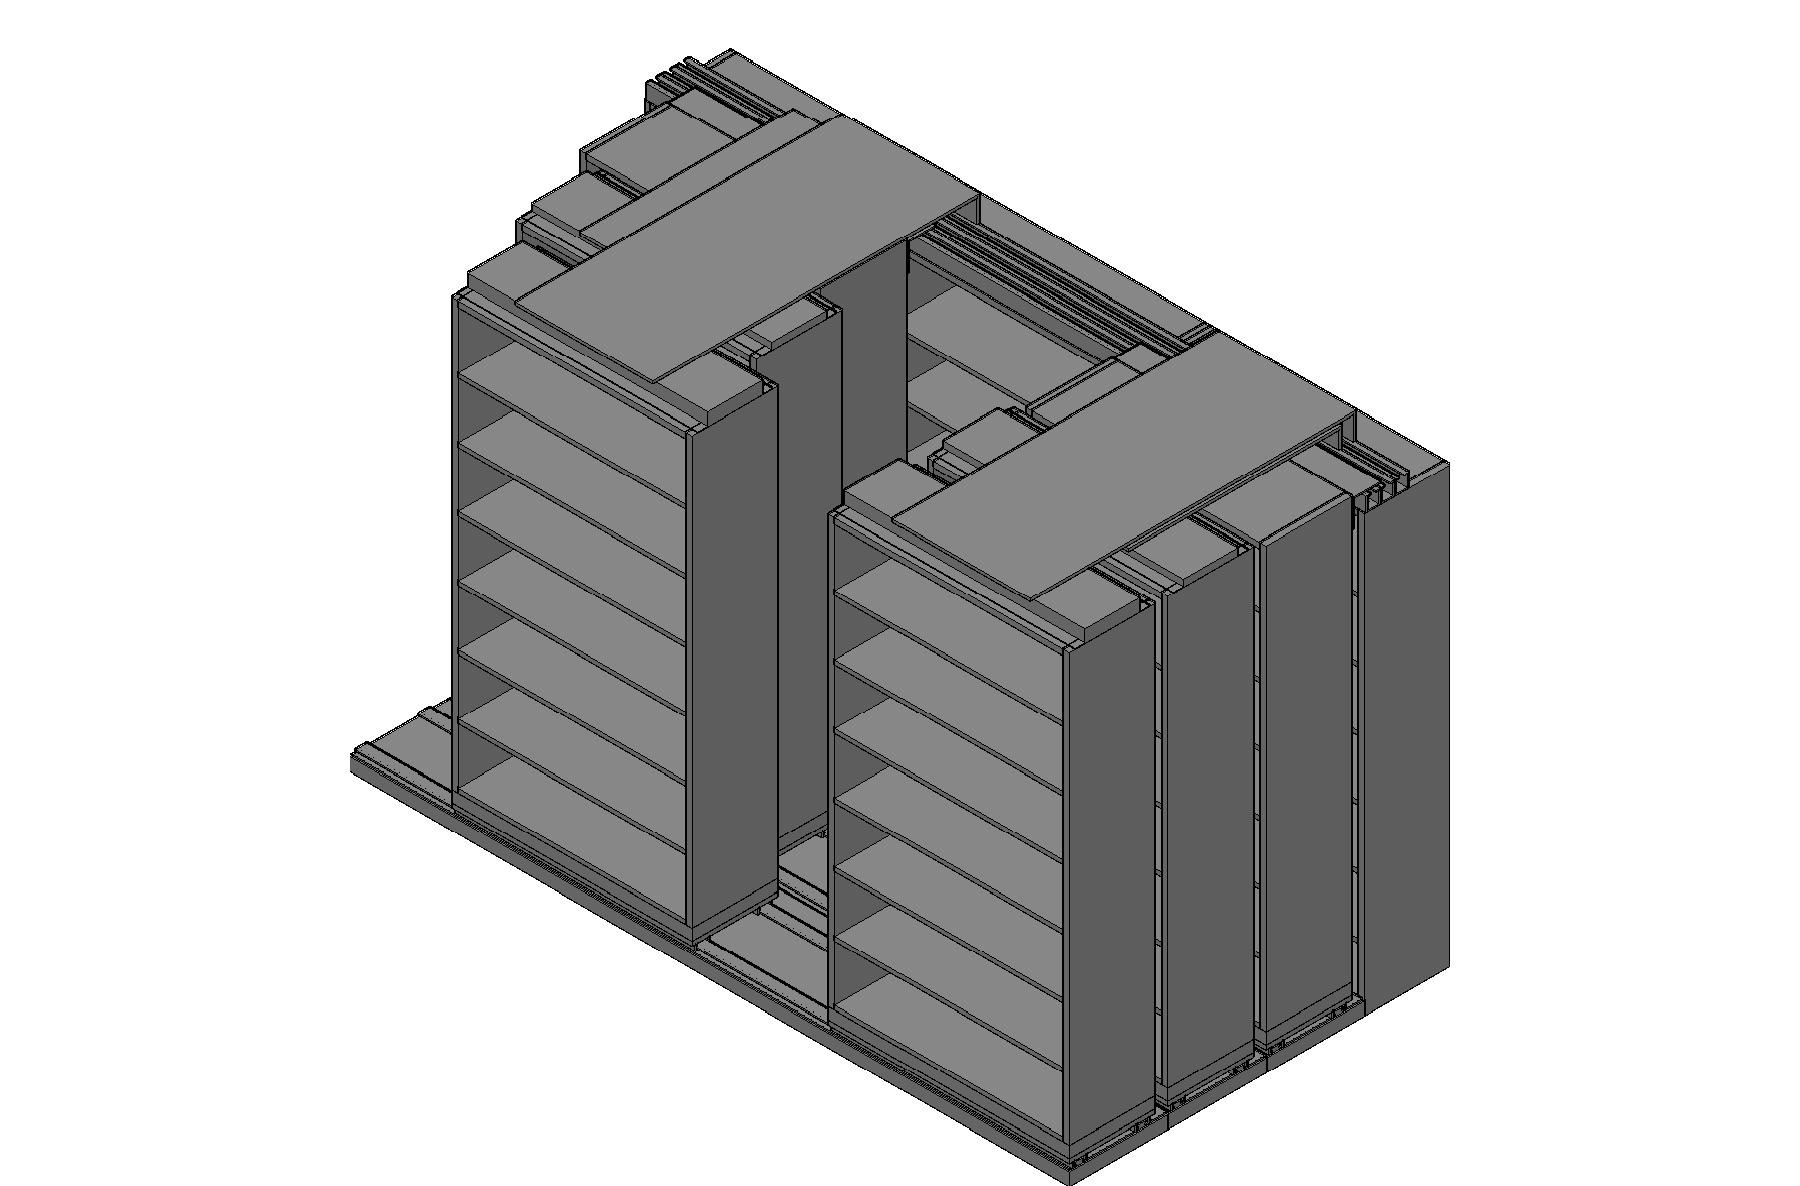 "Legal Size Sliding Shelves - 4 Rows Deep - 7 Levels - (42"" x 15"" Shelves) - 130"" Total Width"